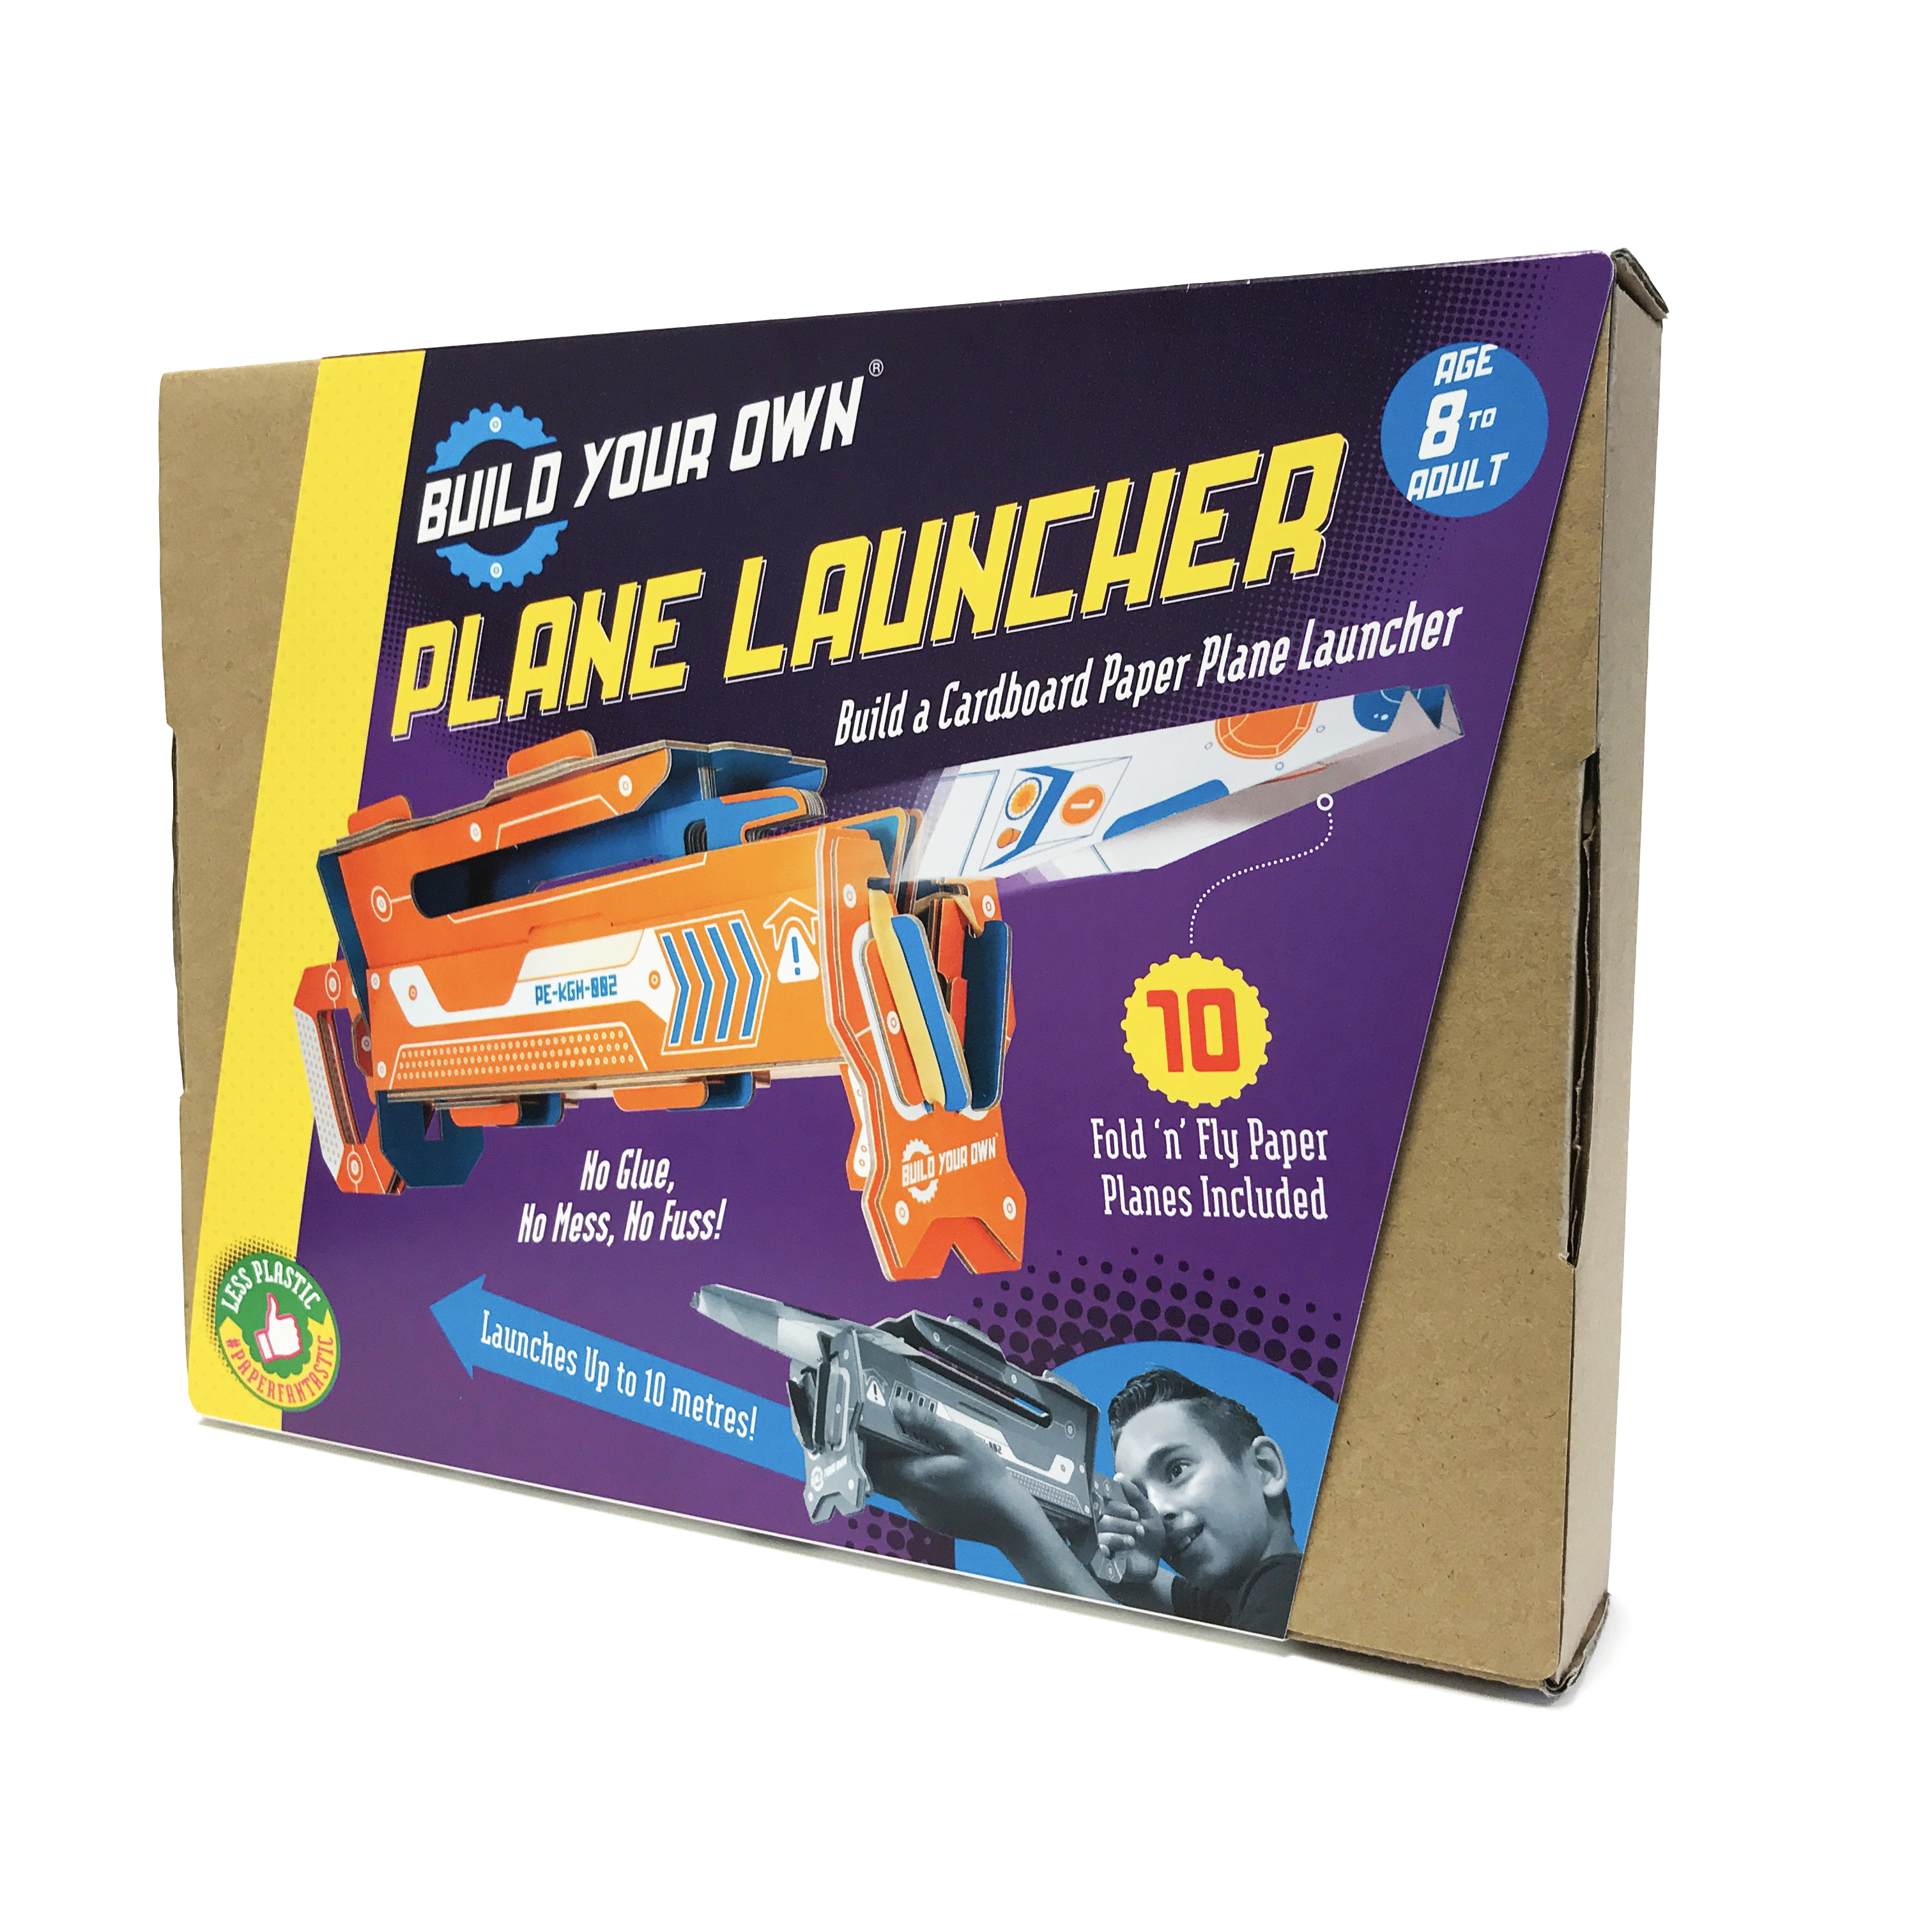 BYO Plane Launcher